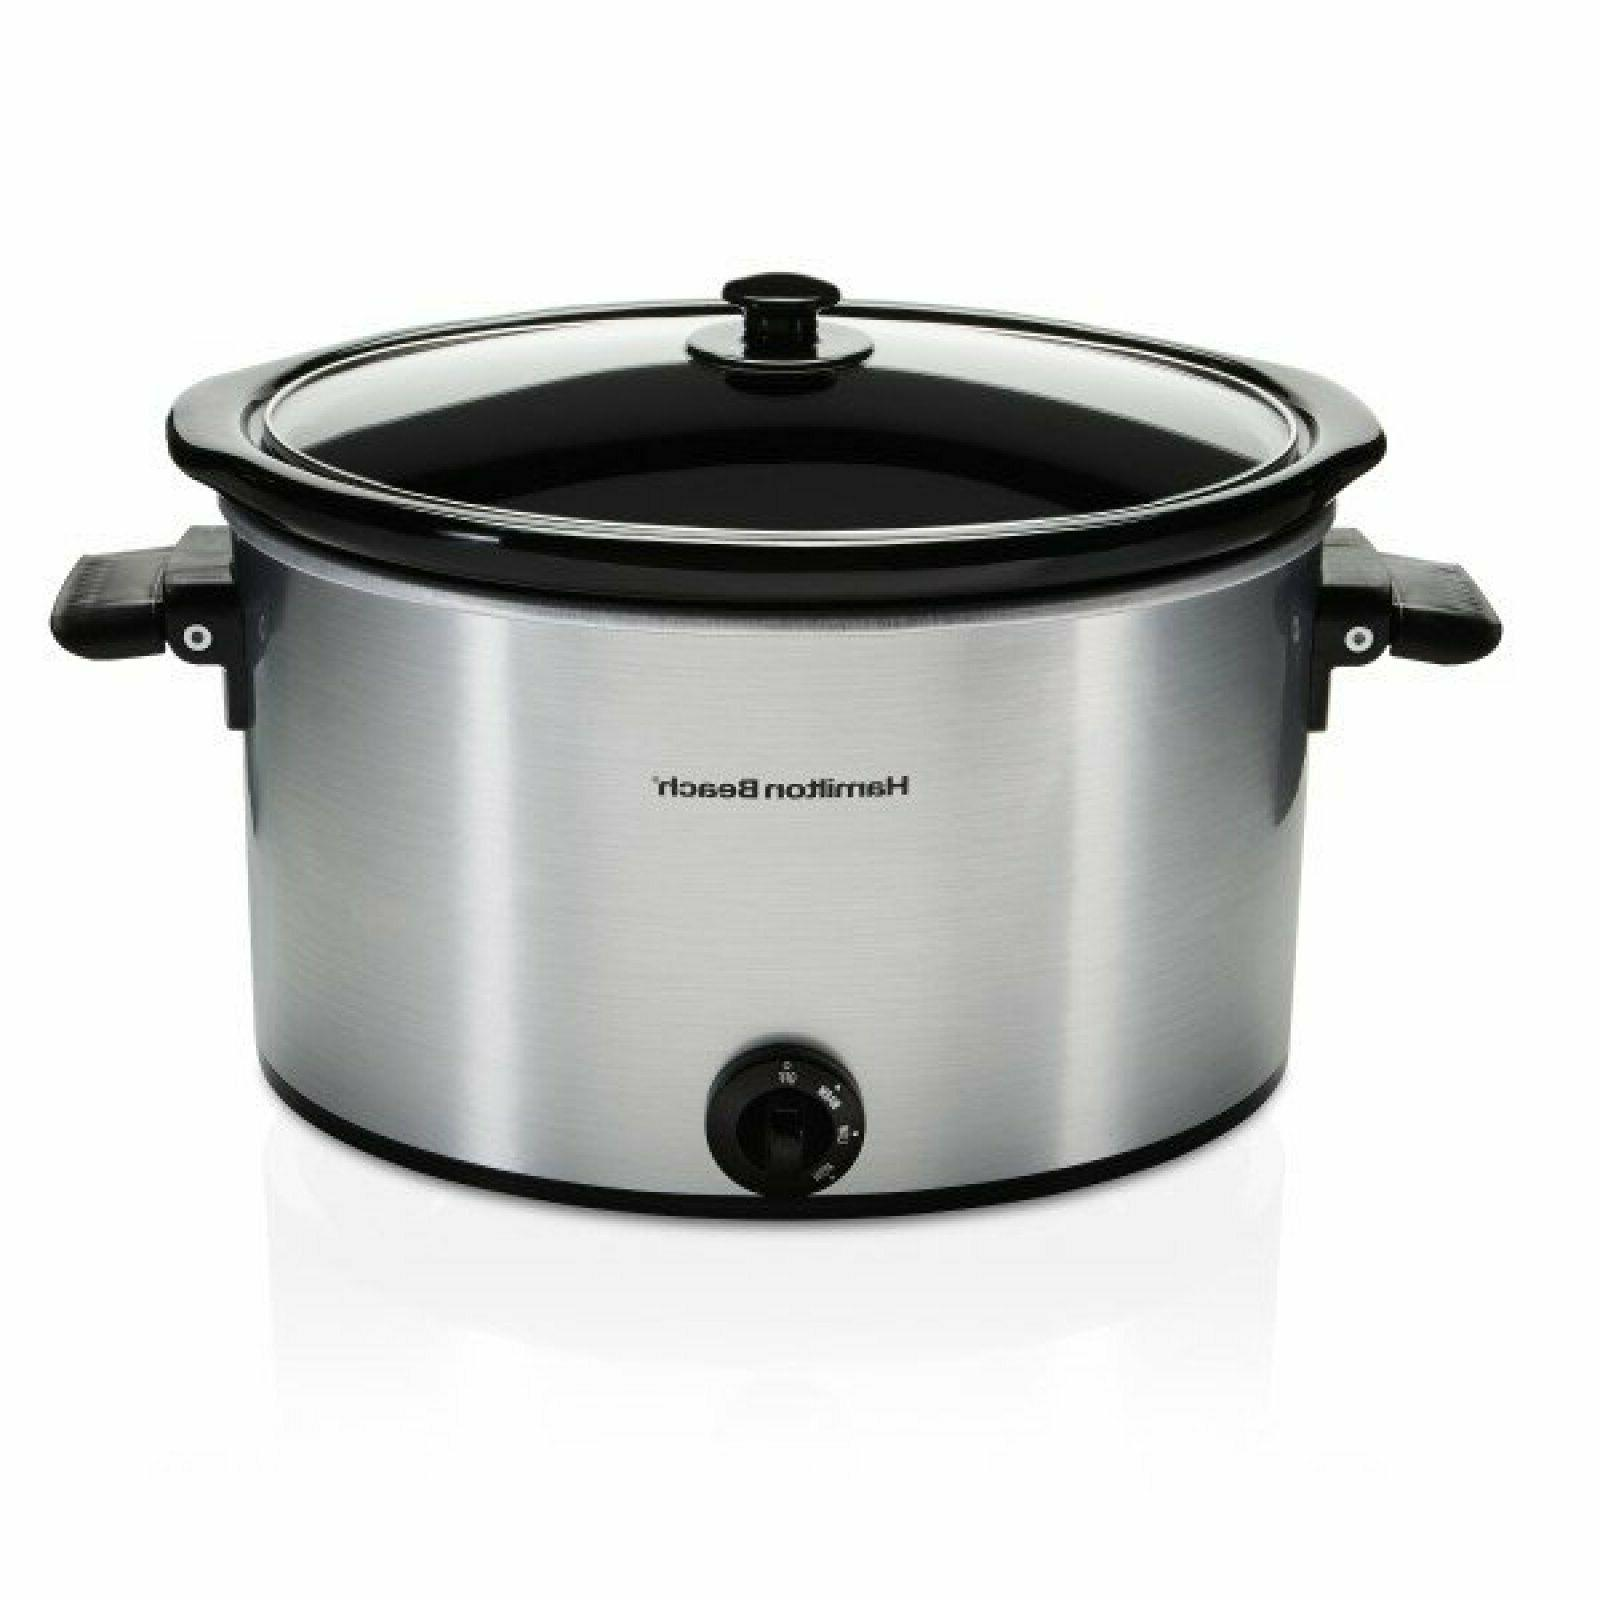 Hamilton Beach Slow 10 Quart Large Pot Kitchen Appliance